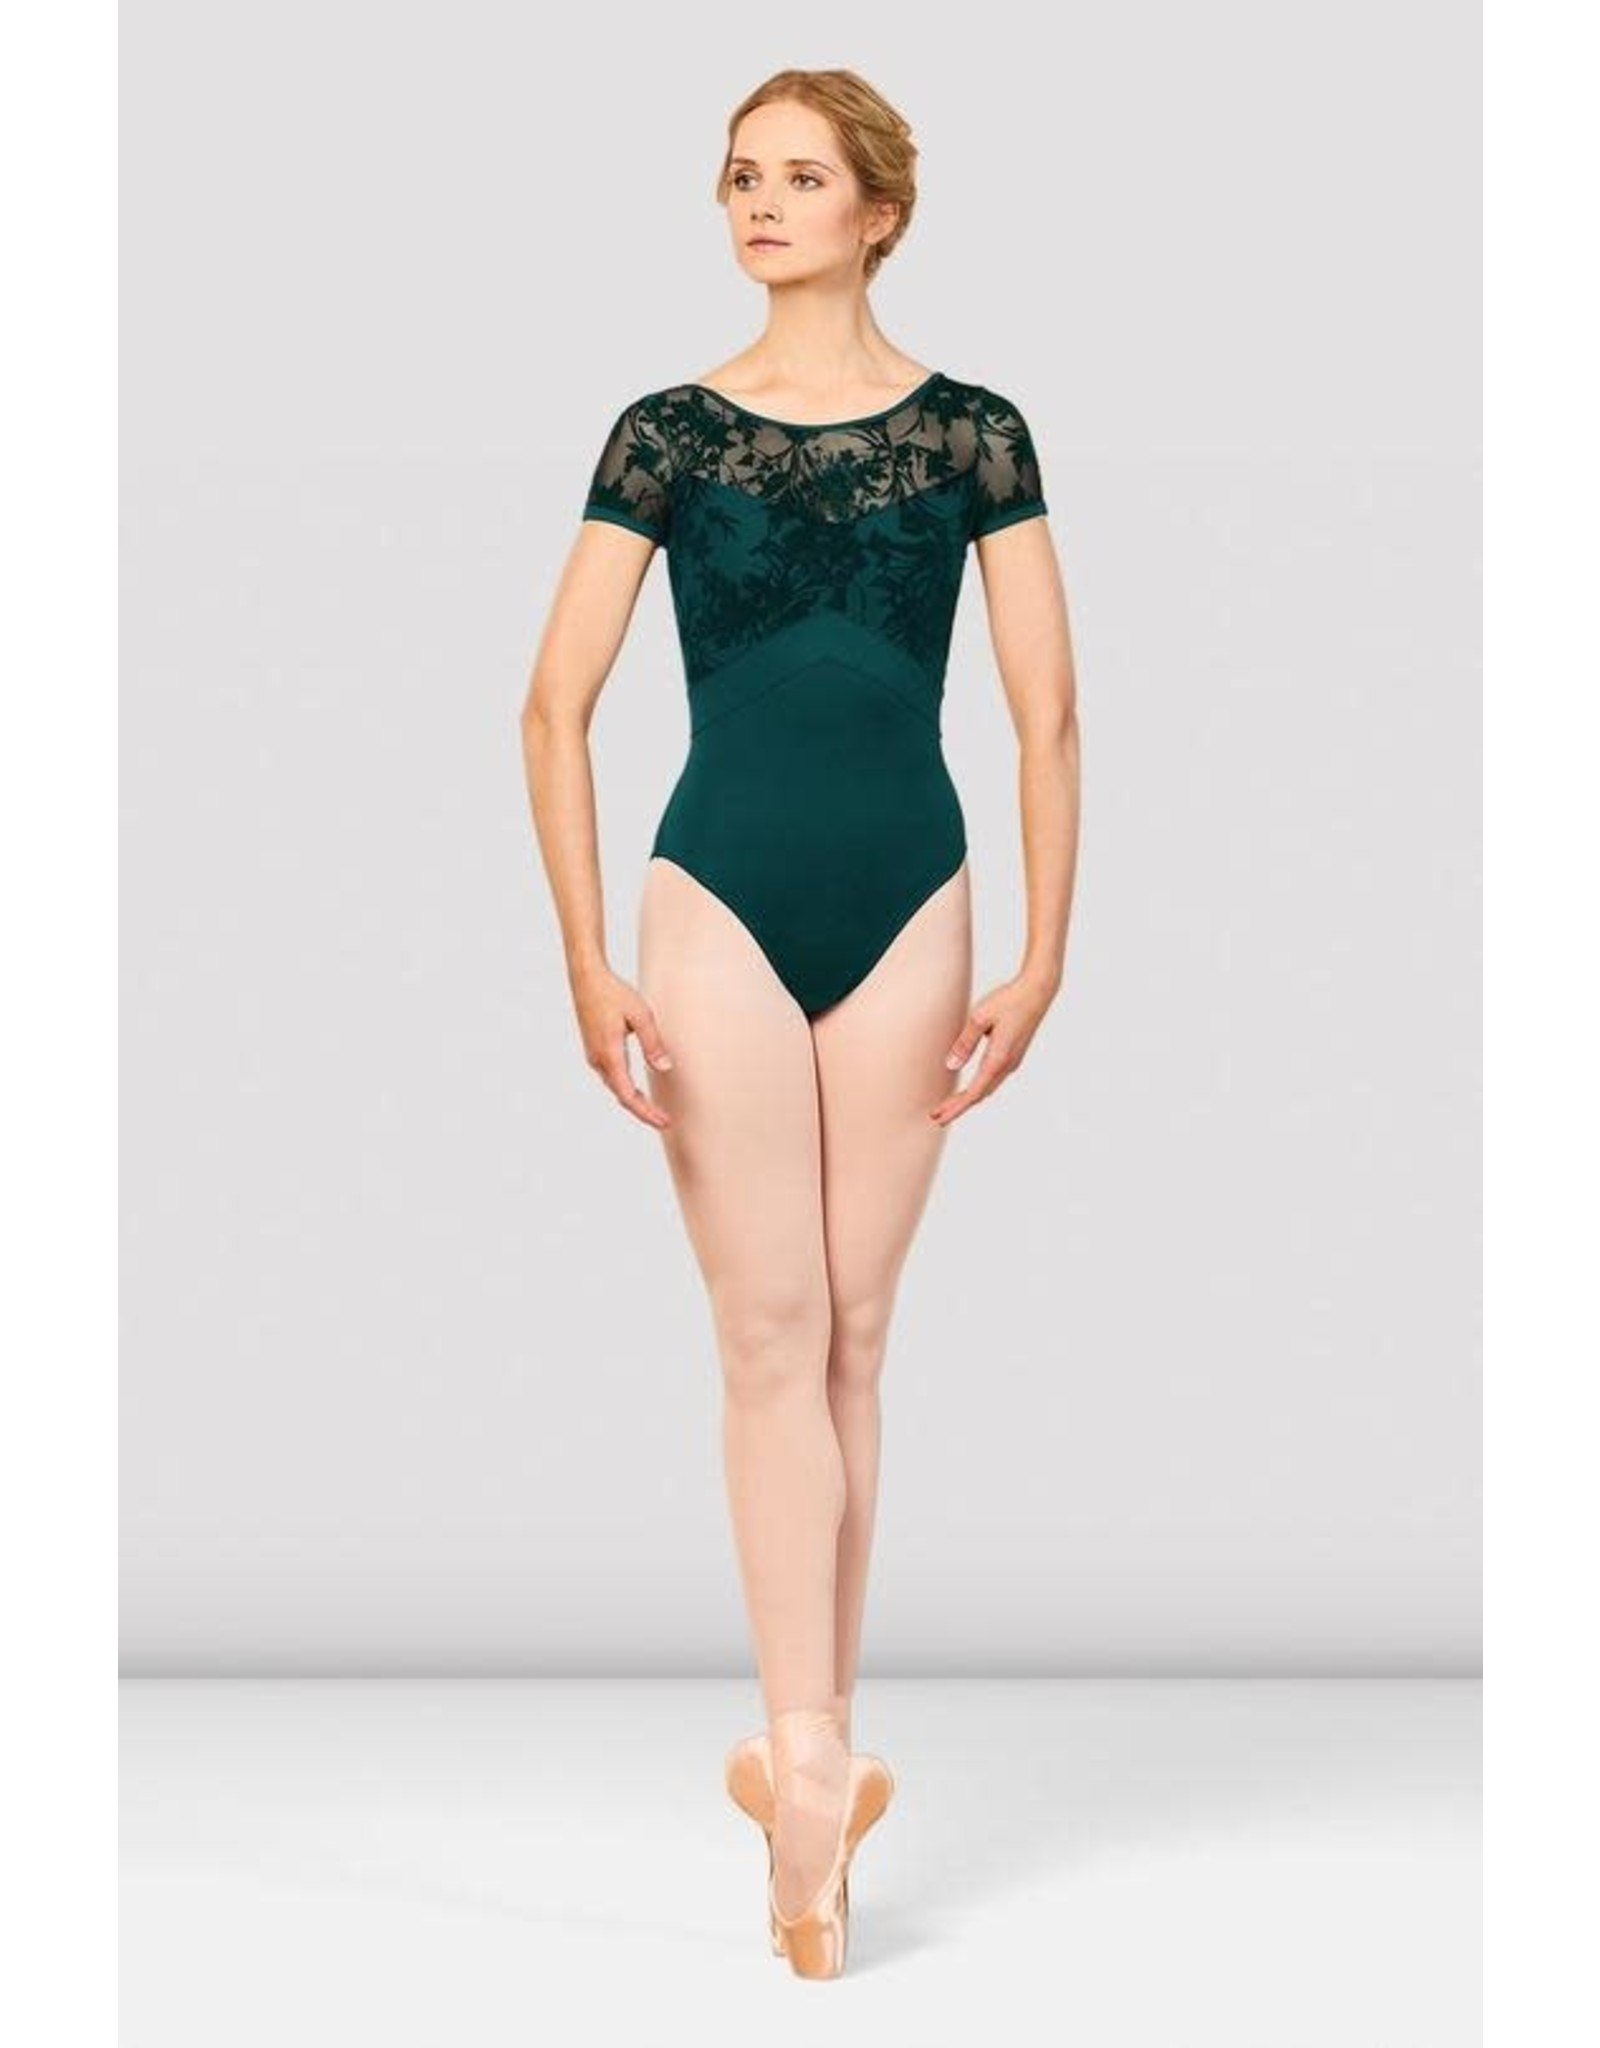 Bloch L7892 Balletpak Eliana floral mesh